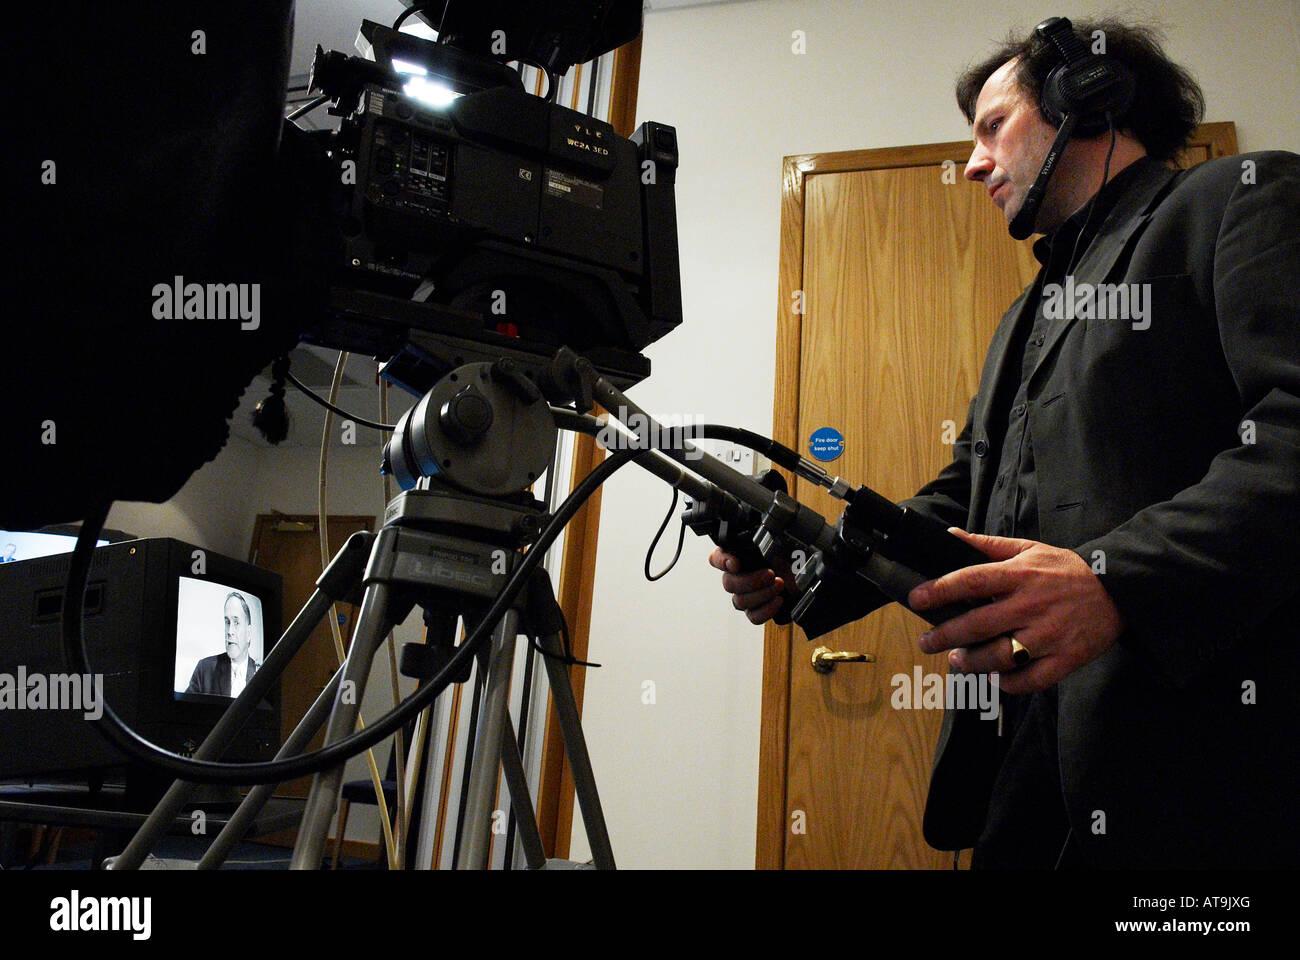 A camera man recording a tv program - Stock Image